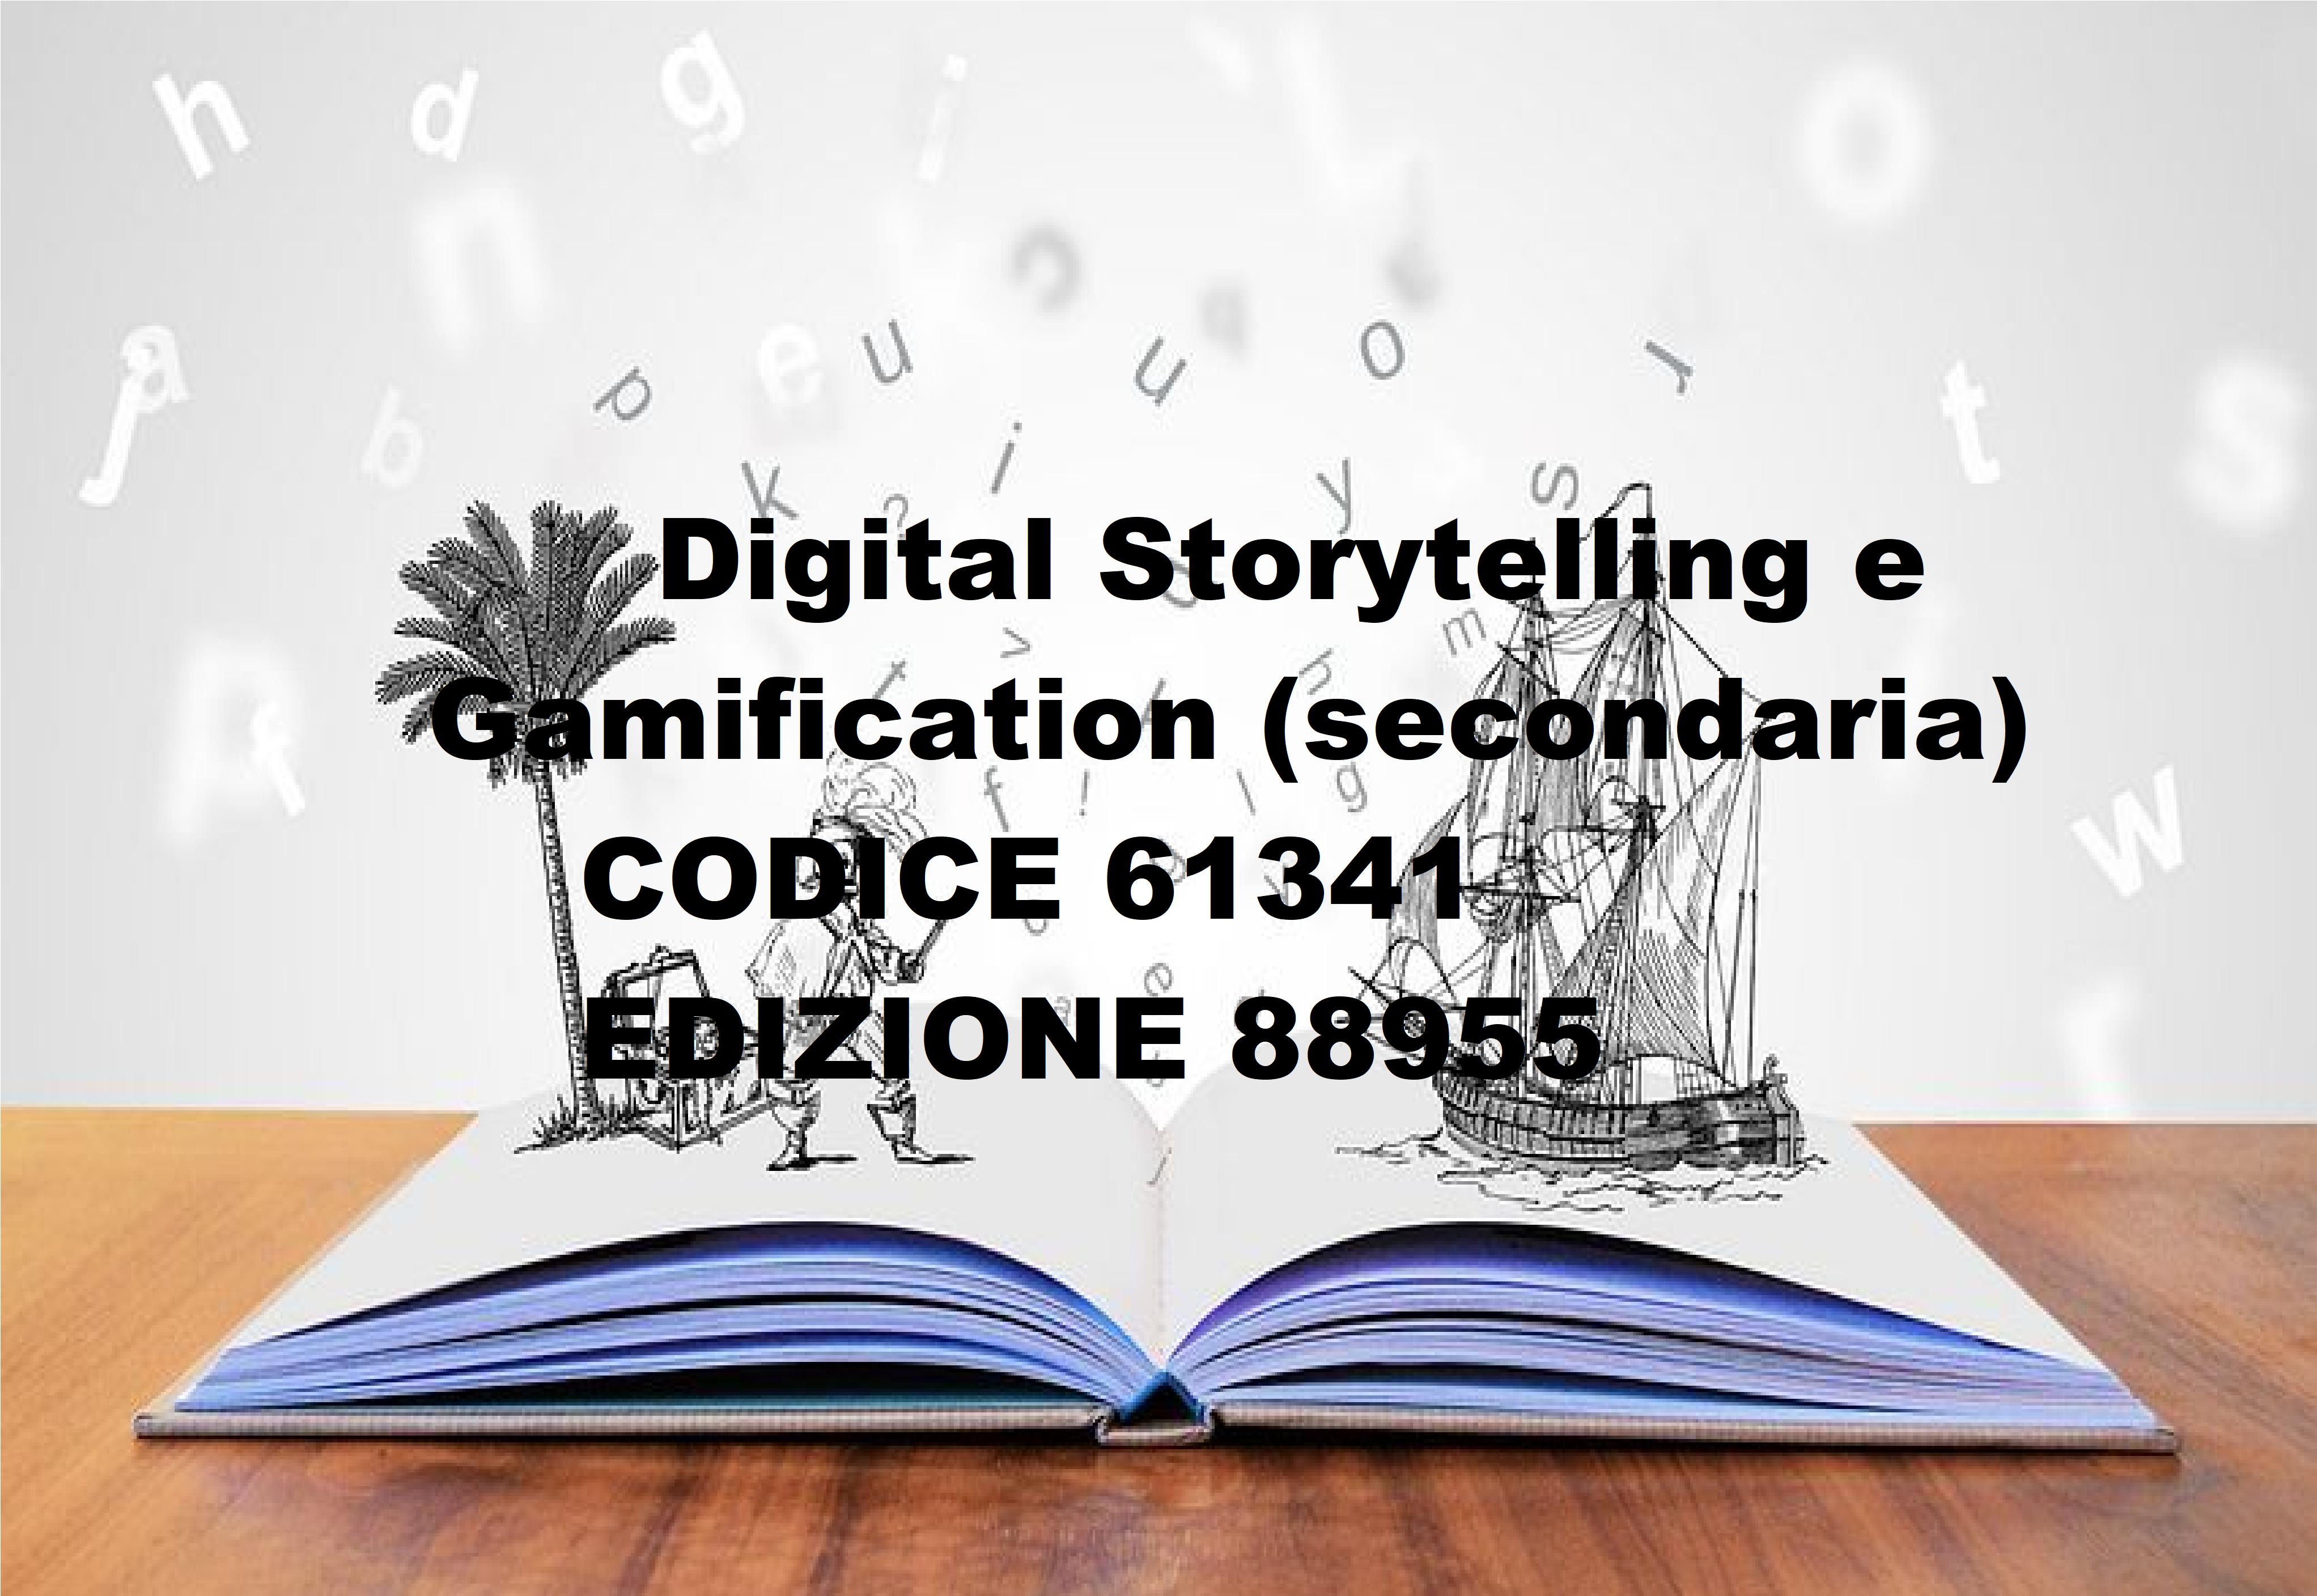 88955 Digital Storytelling e Gamification (secondaria)